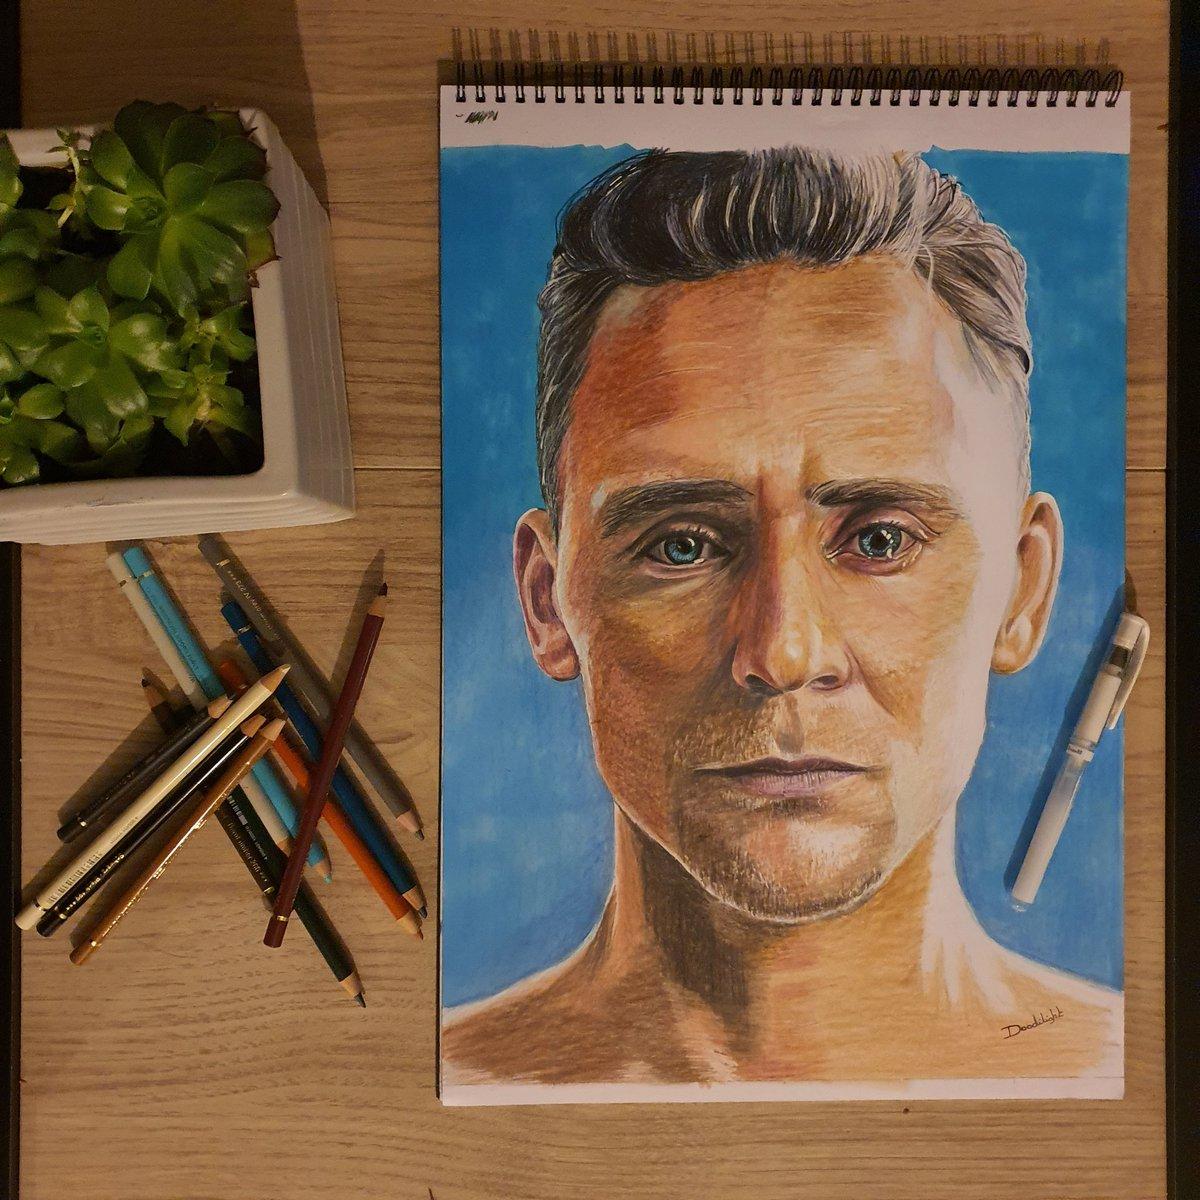 Tom Hiddleston 🙊 #tomhiddleston #tomhiddlestonedit #tomhiddlestonedits #loki #lokiedit #lokiedits #fanart #thor #marvel #marvelart #mcu #marveluniverse #portrait #pencildrawing #pencilart #pencilportrait #pencilsketch #crayondecouleur #crayon @fabercastellfrance @twhiddleston